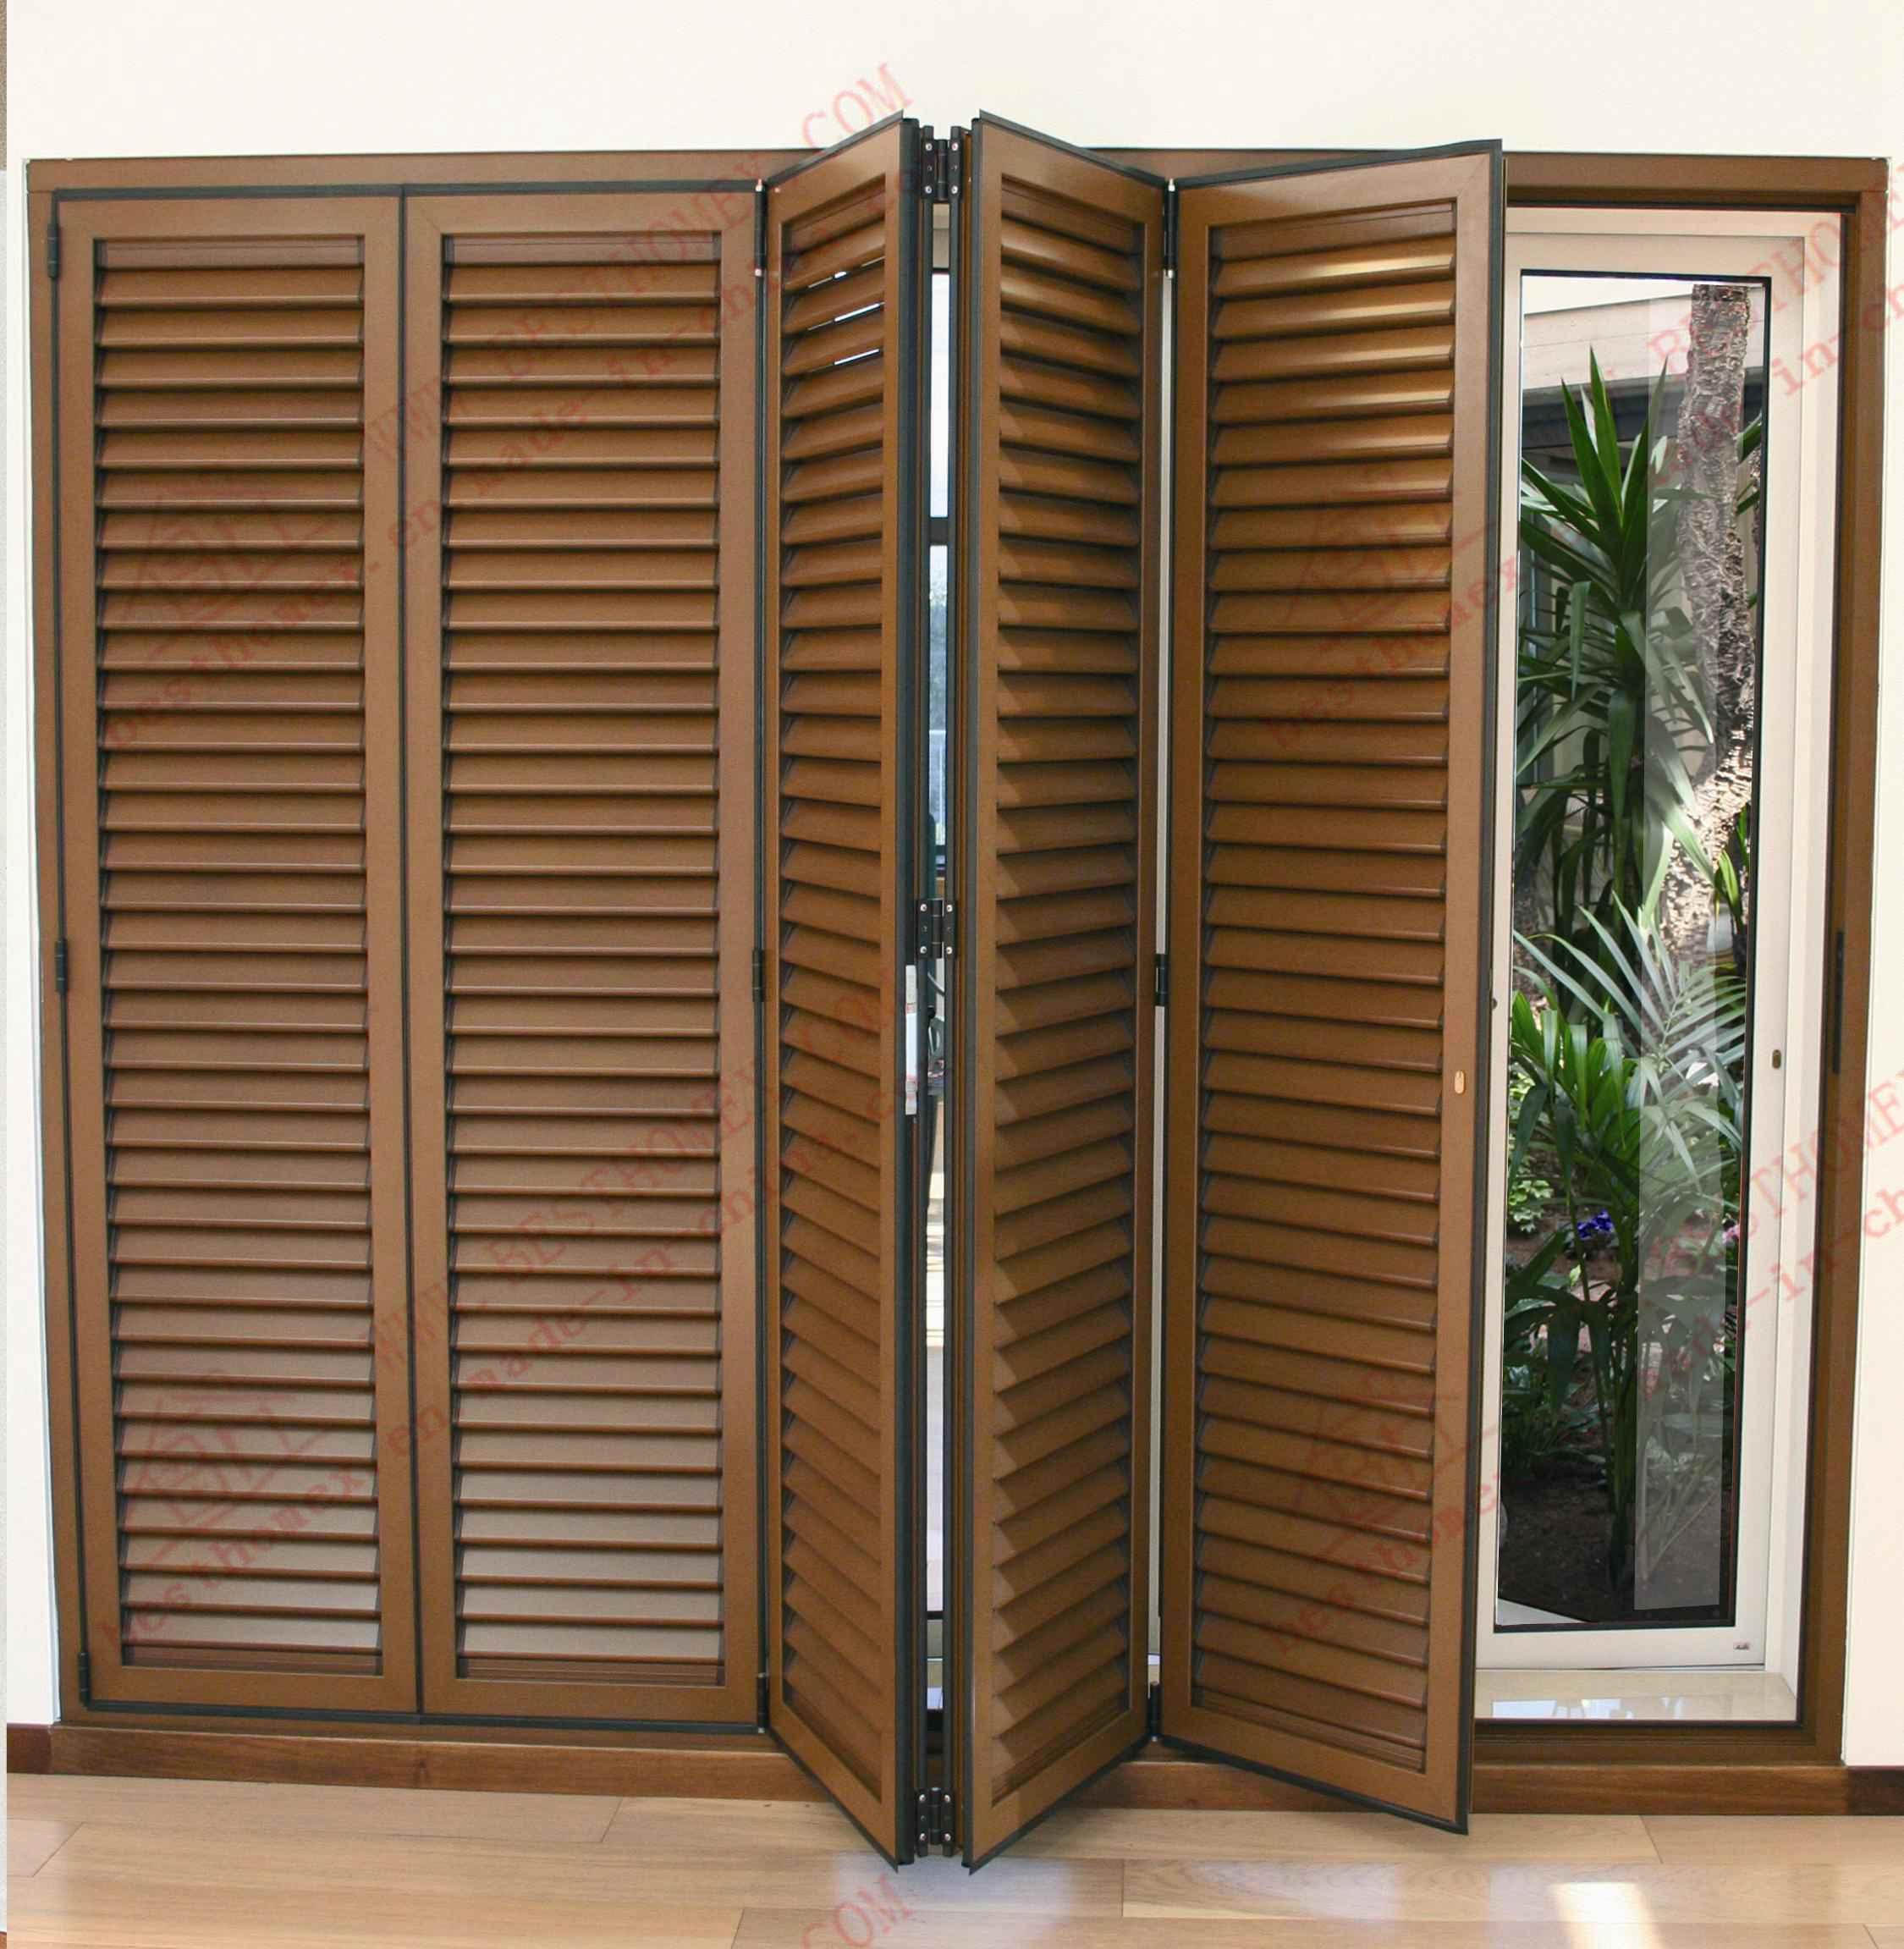 Exterior: China High Quality Woodgrain Aluminum Bi-Folding Shutter